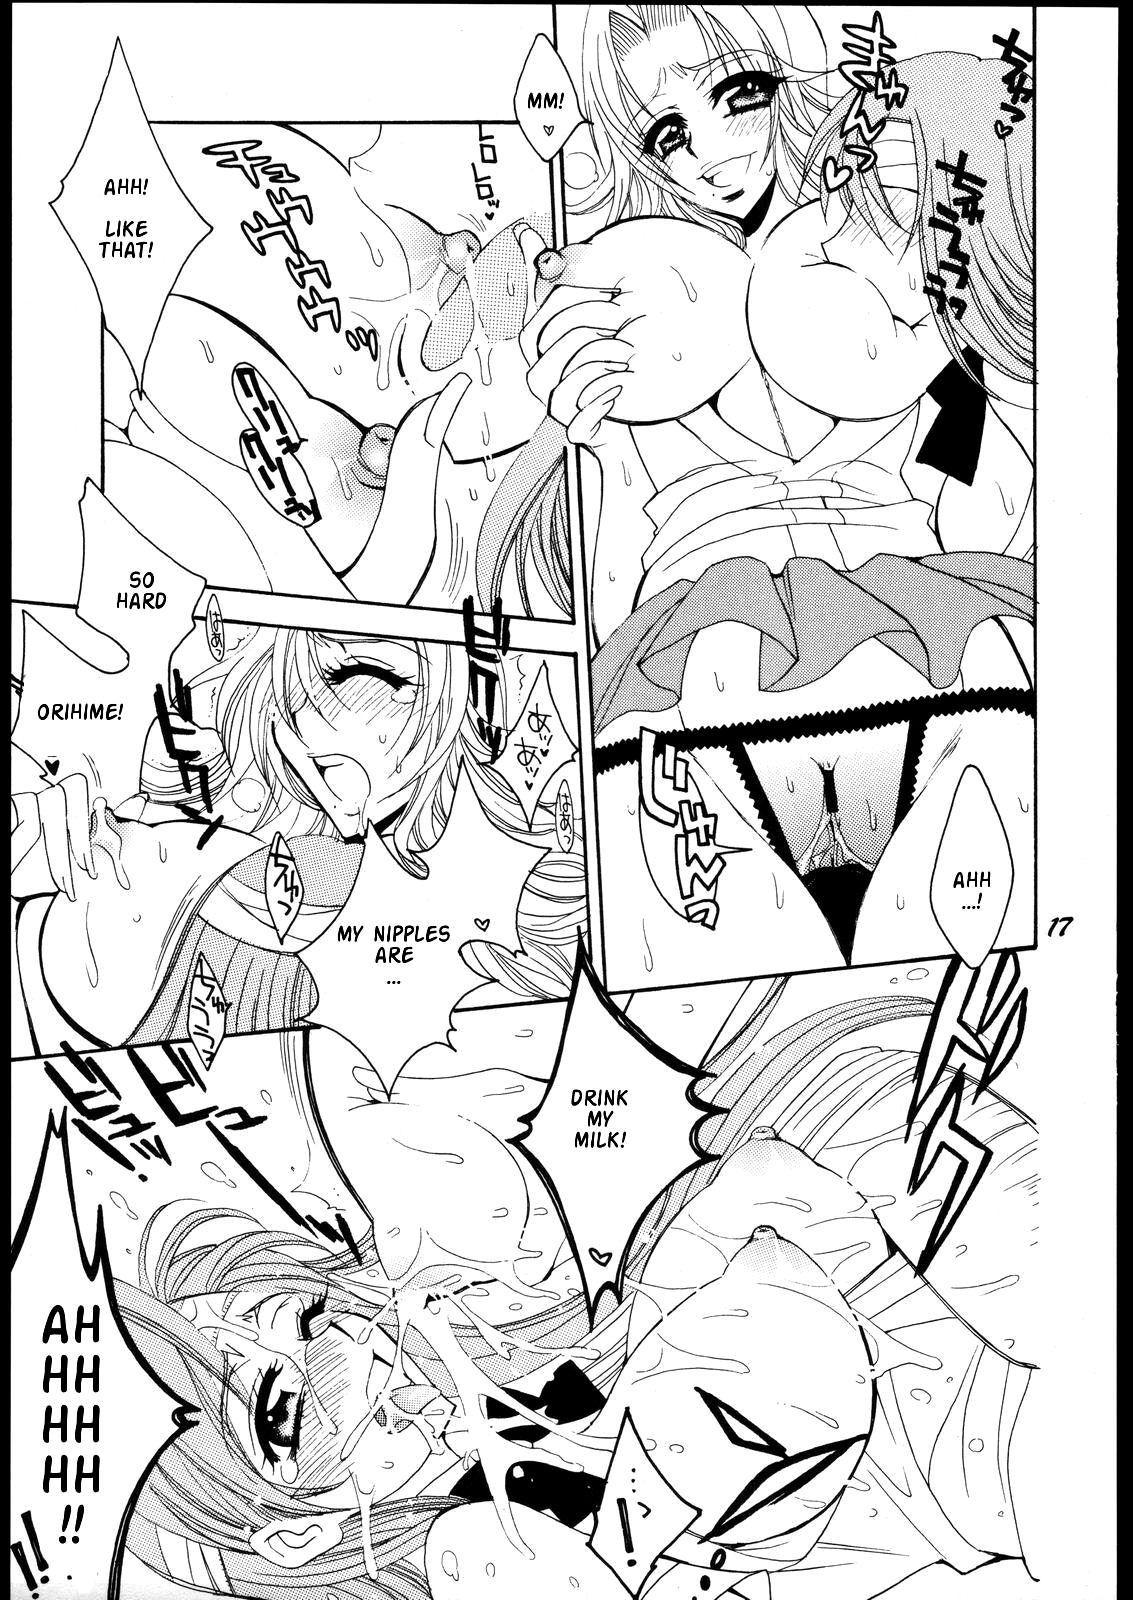 Love Potion #9 15